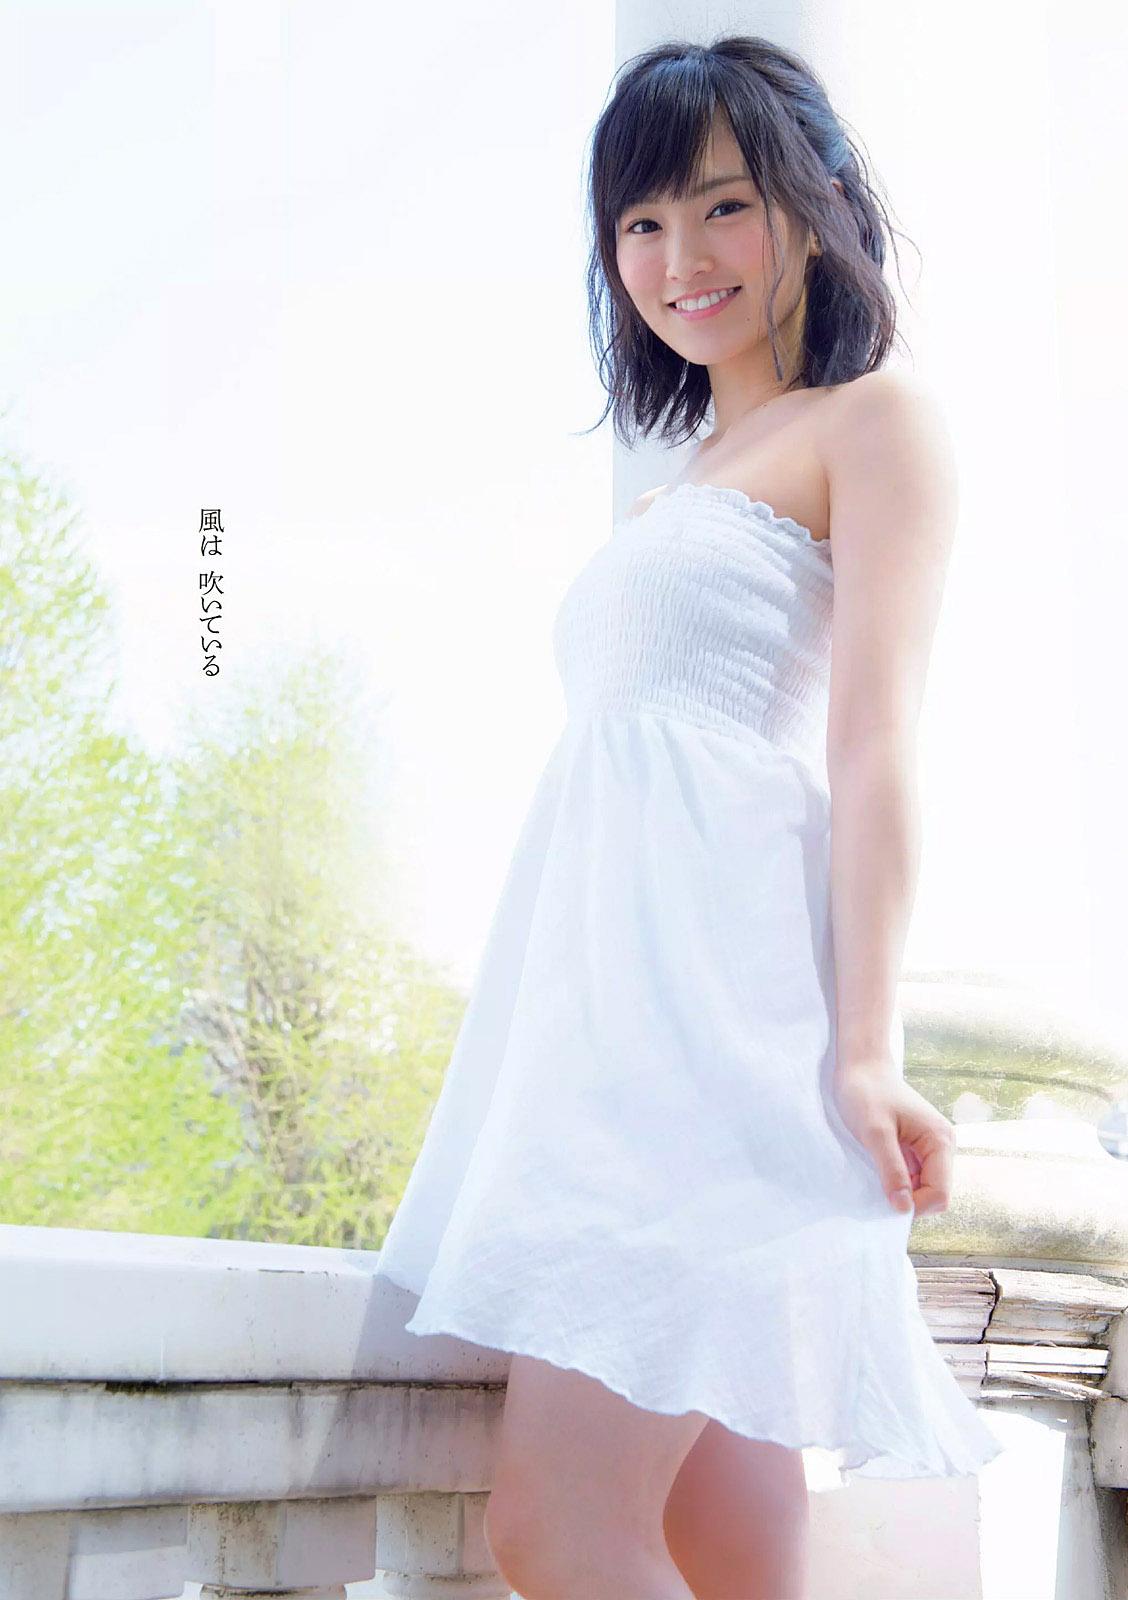 SYamamoto WPB 150518 05.jpg